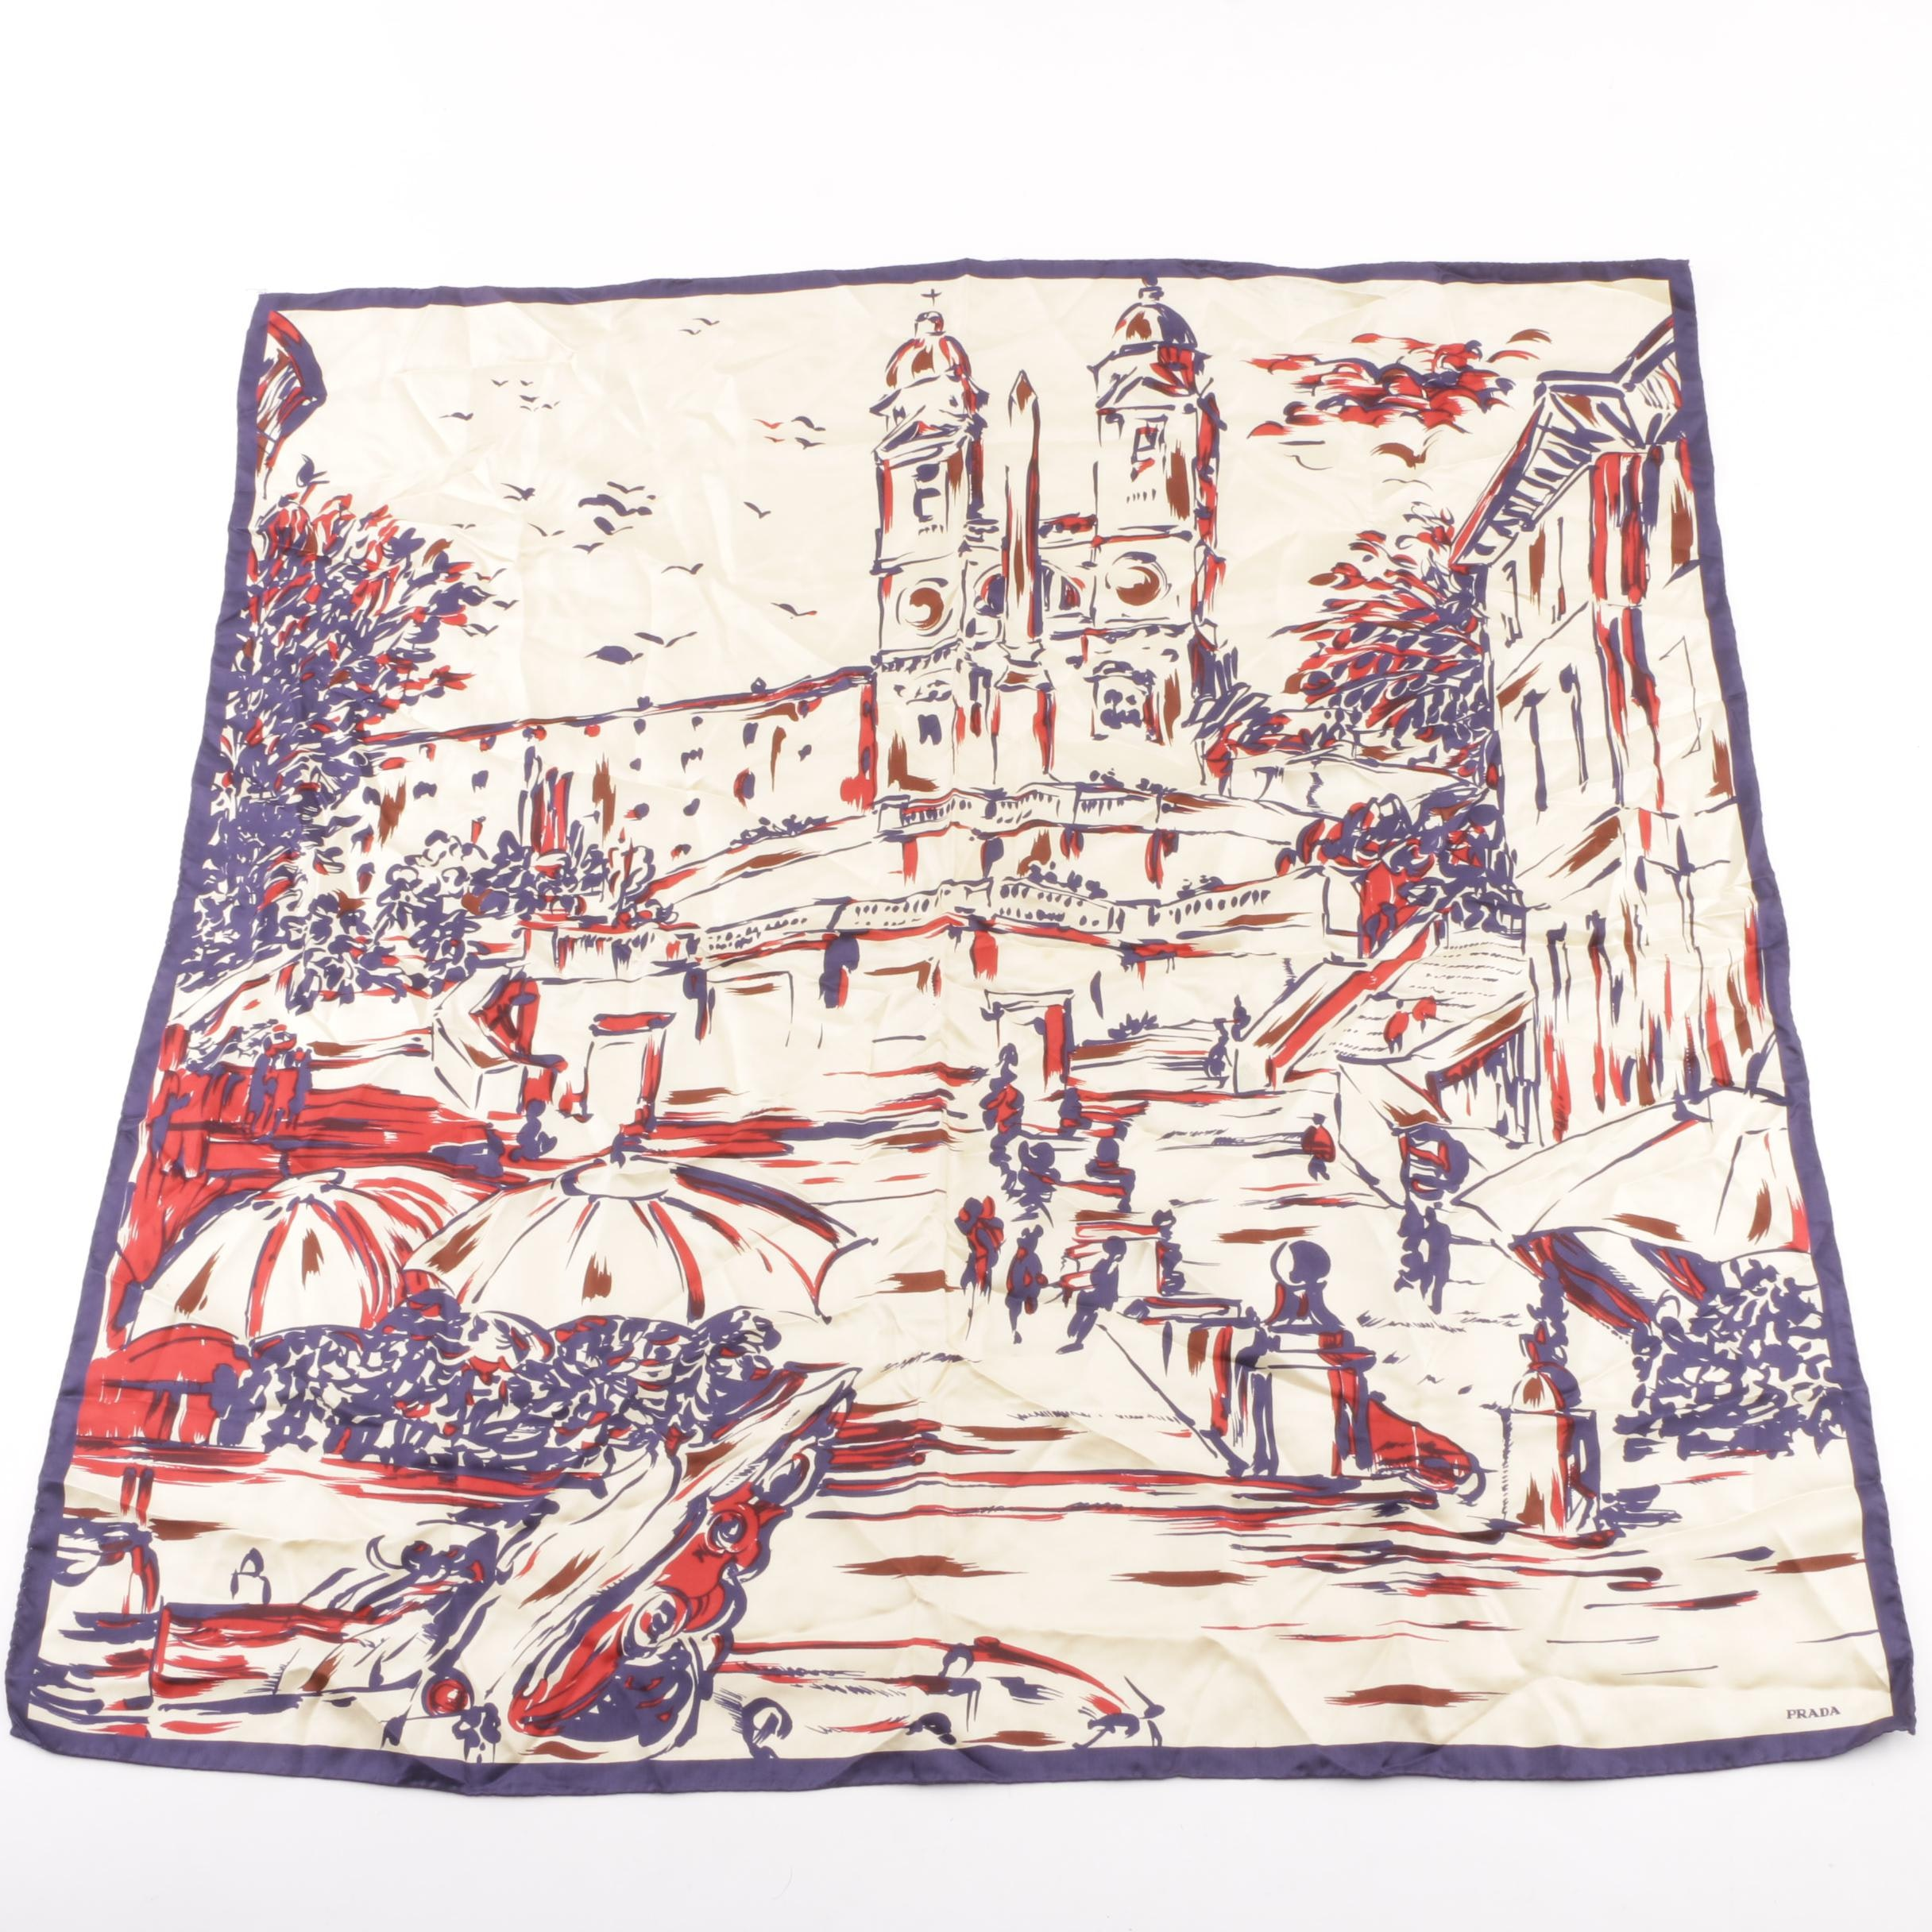 Prada Rome Print Silk Twill Scarf